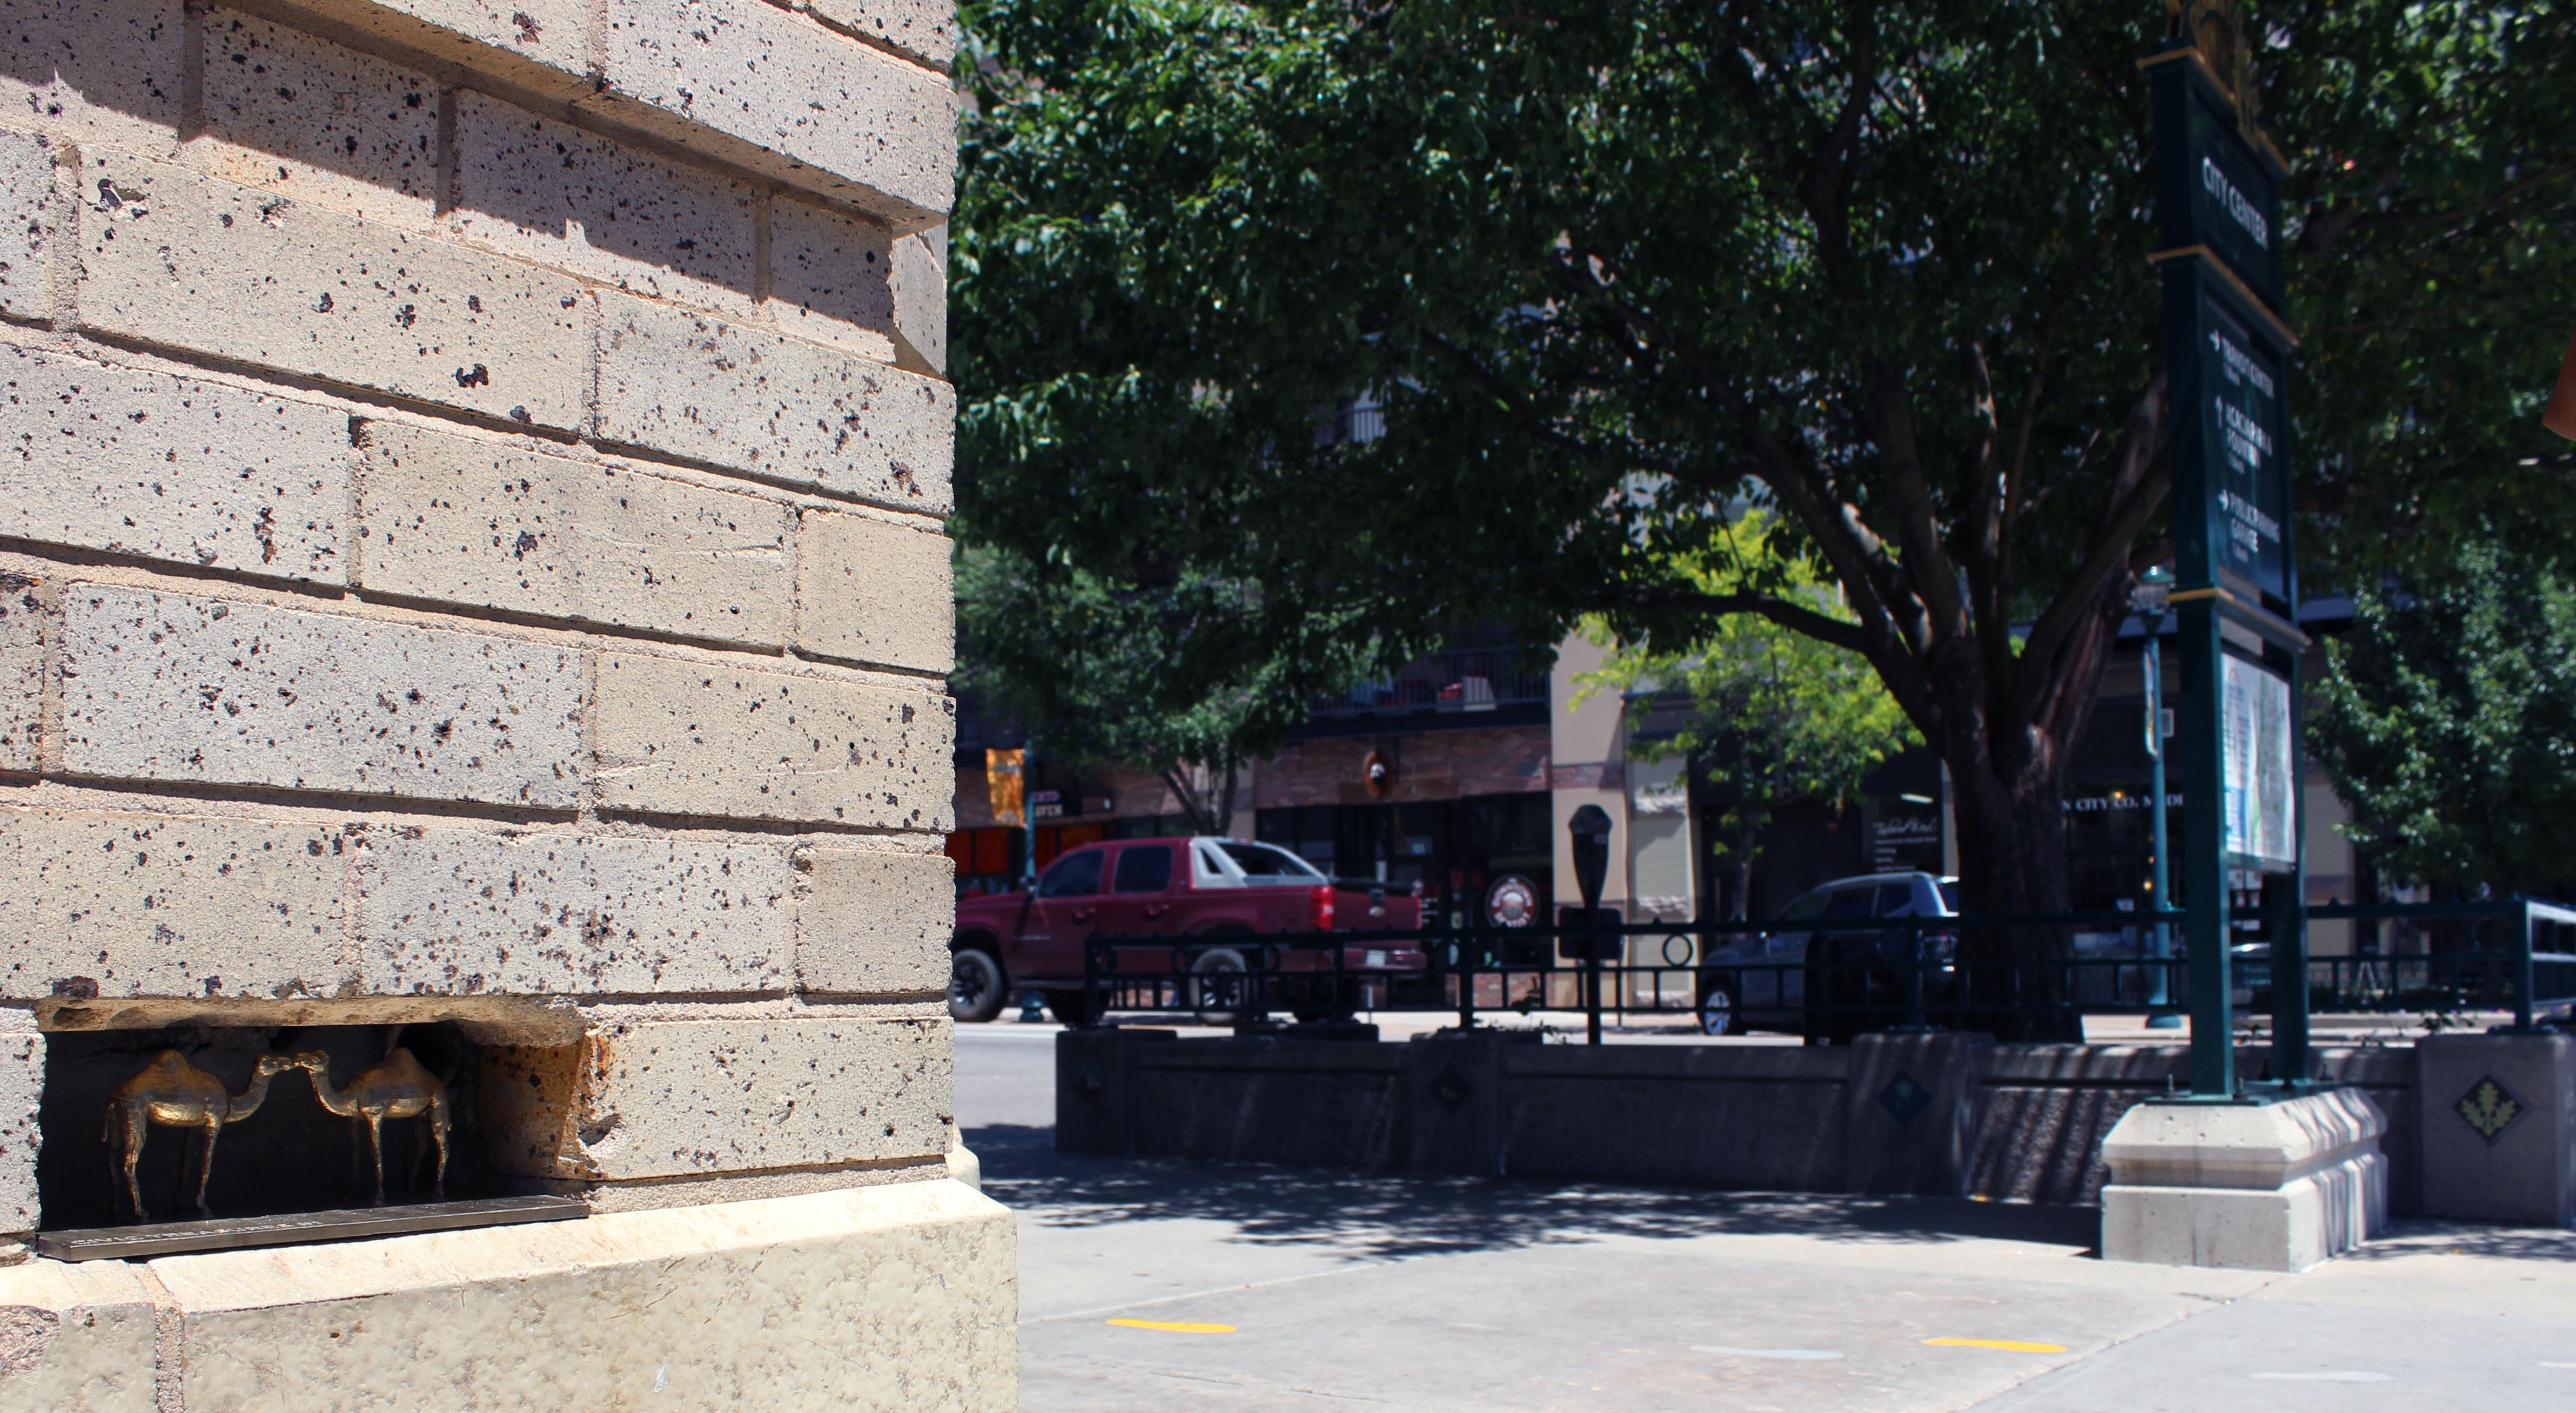 kissing camels art on tejon street